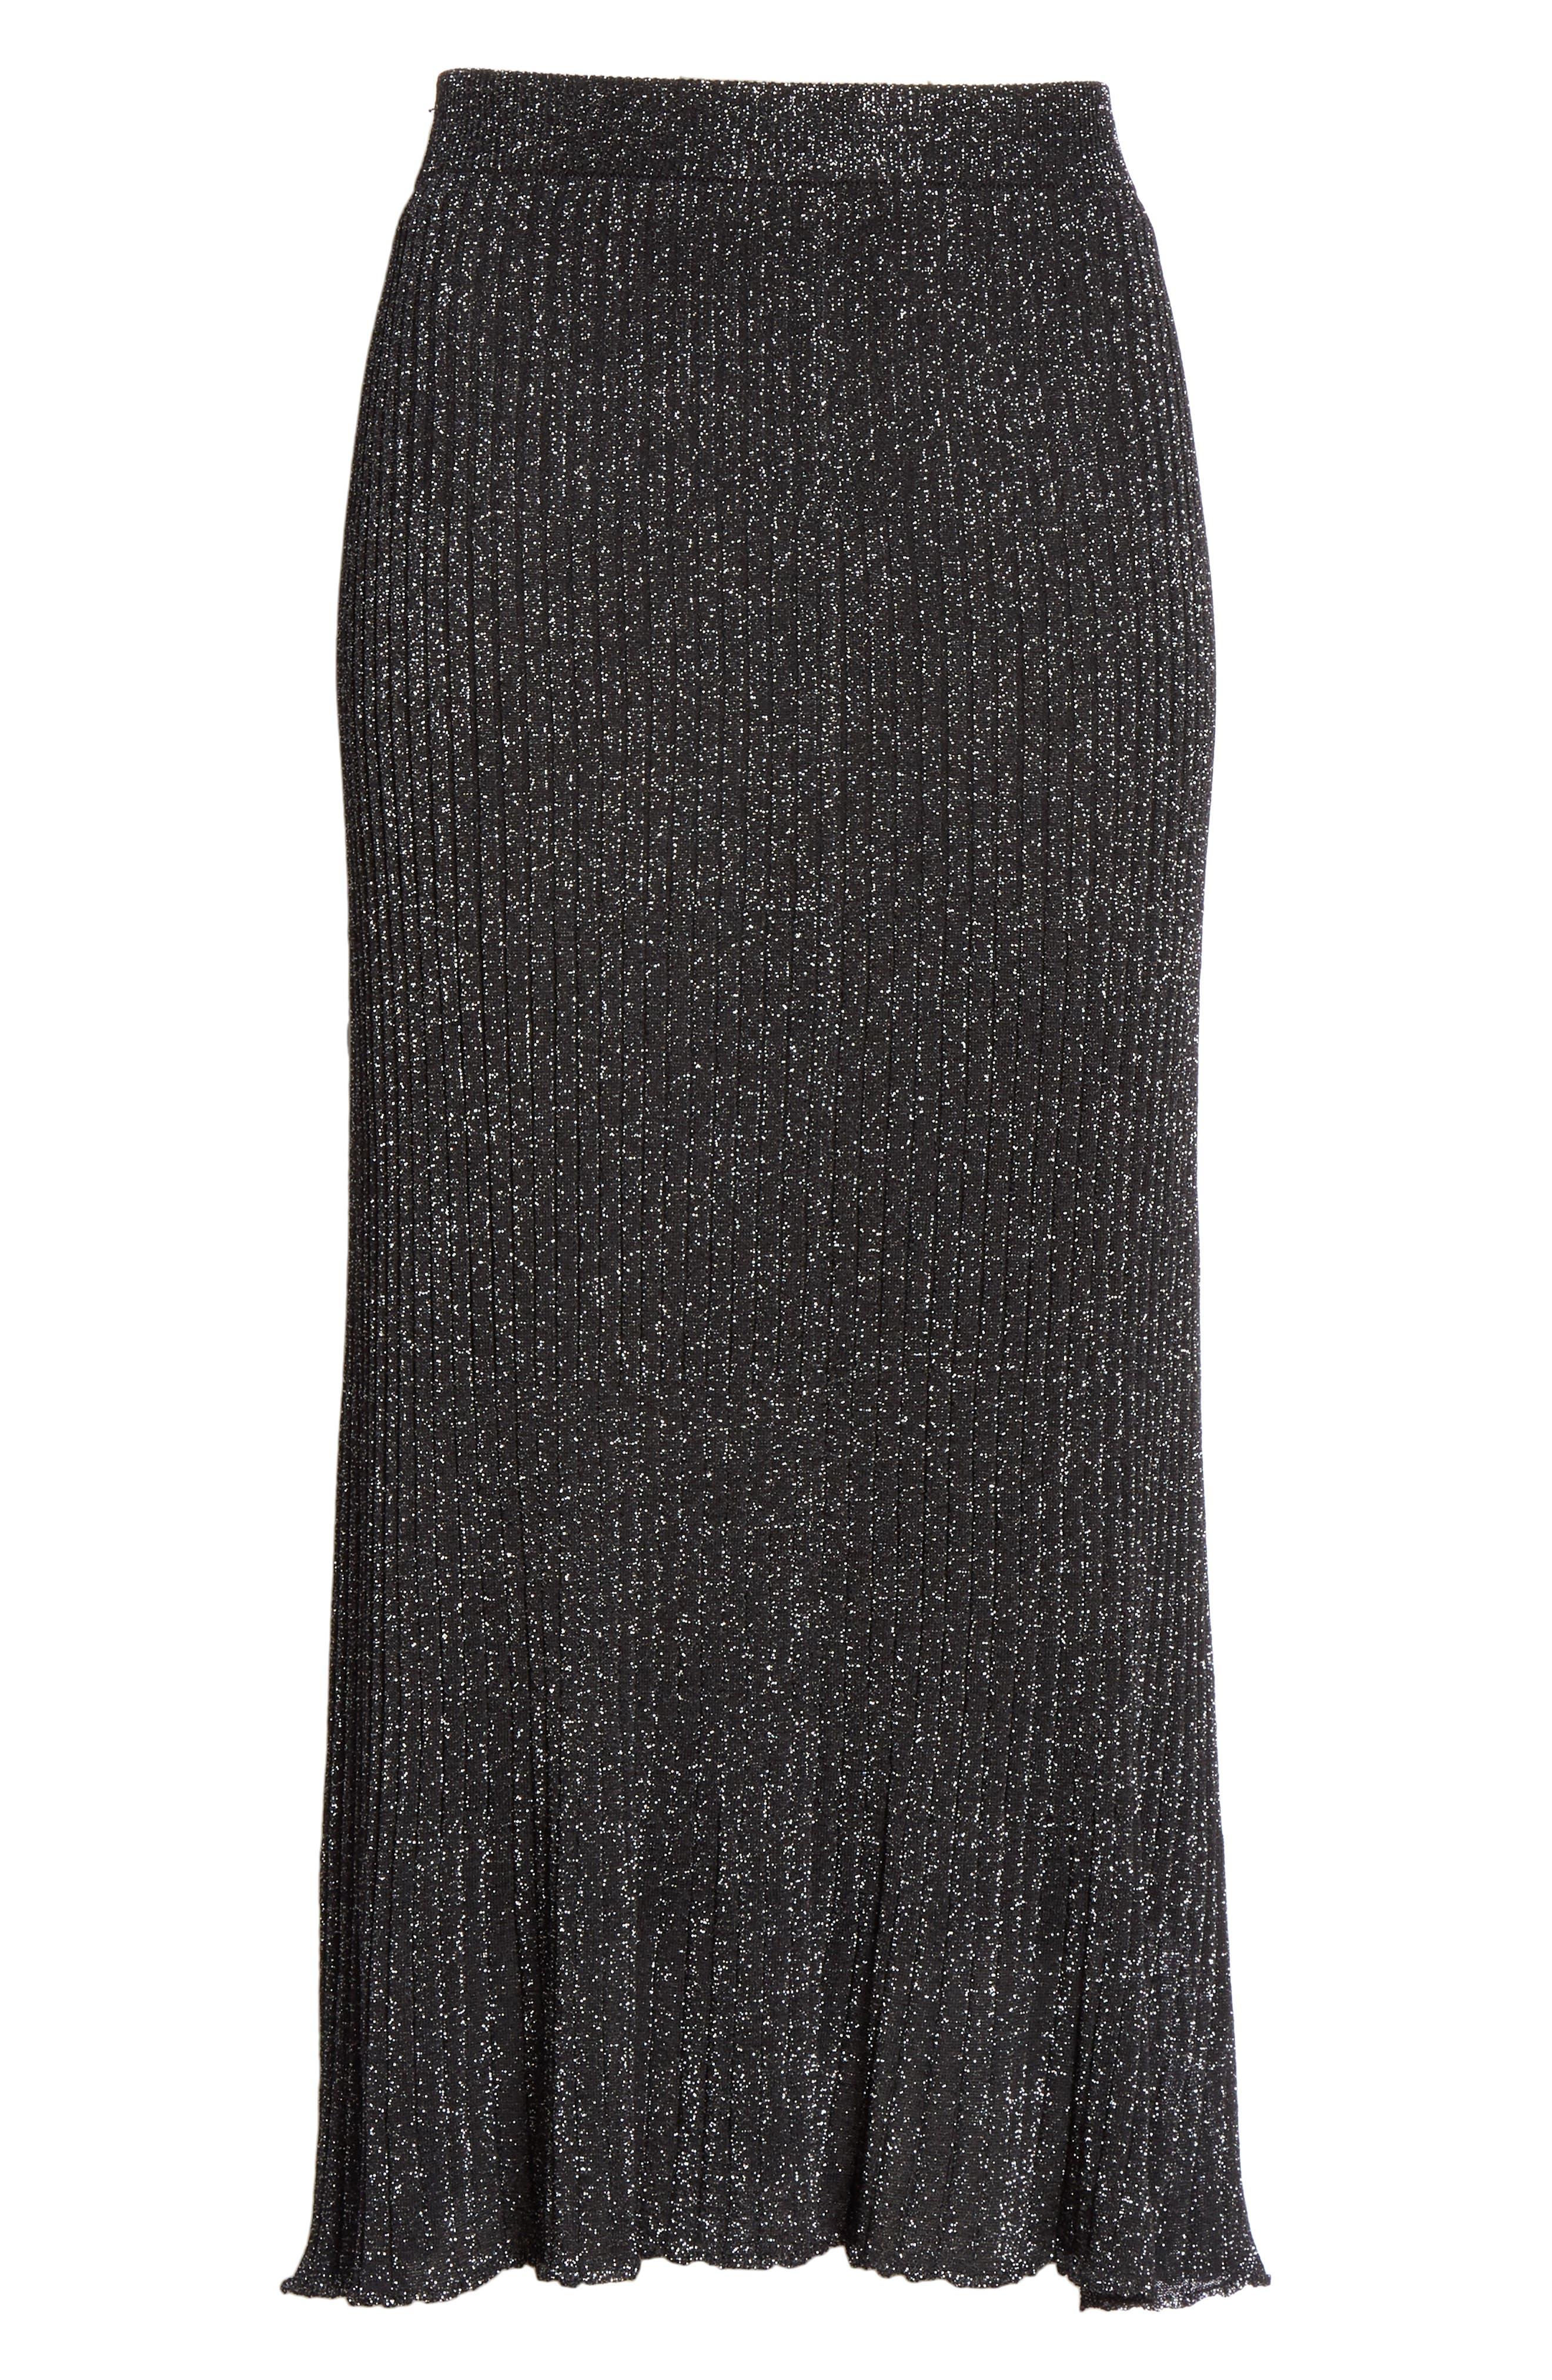 Othello Metallic Ribbed Skirt,                             Alternate thumbnail 6, color,                             BLACK